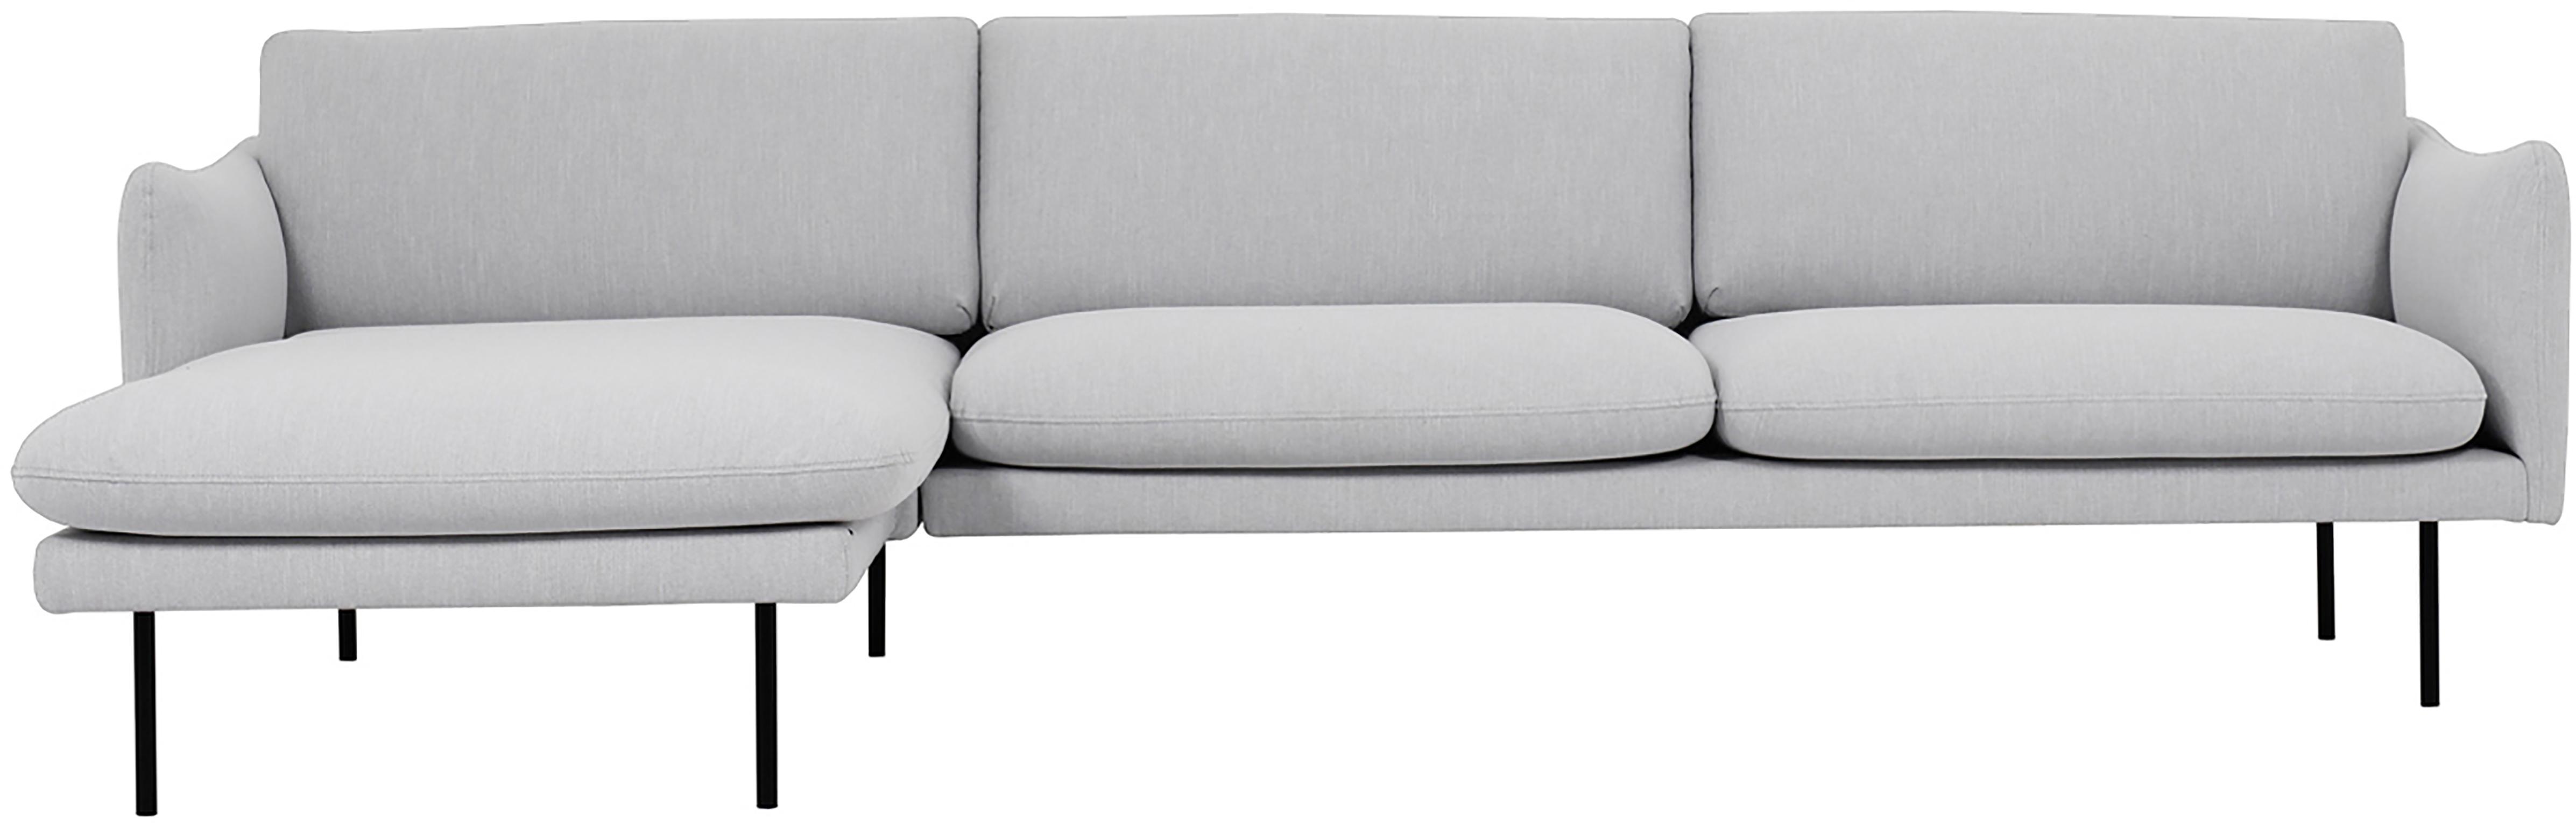 Ecksofa Moby, Bezug: Polyester Der hochwertige, Gestell: Massives Kiefernholz, Webstoff Hellgrau, B 280 x T 160 cm